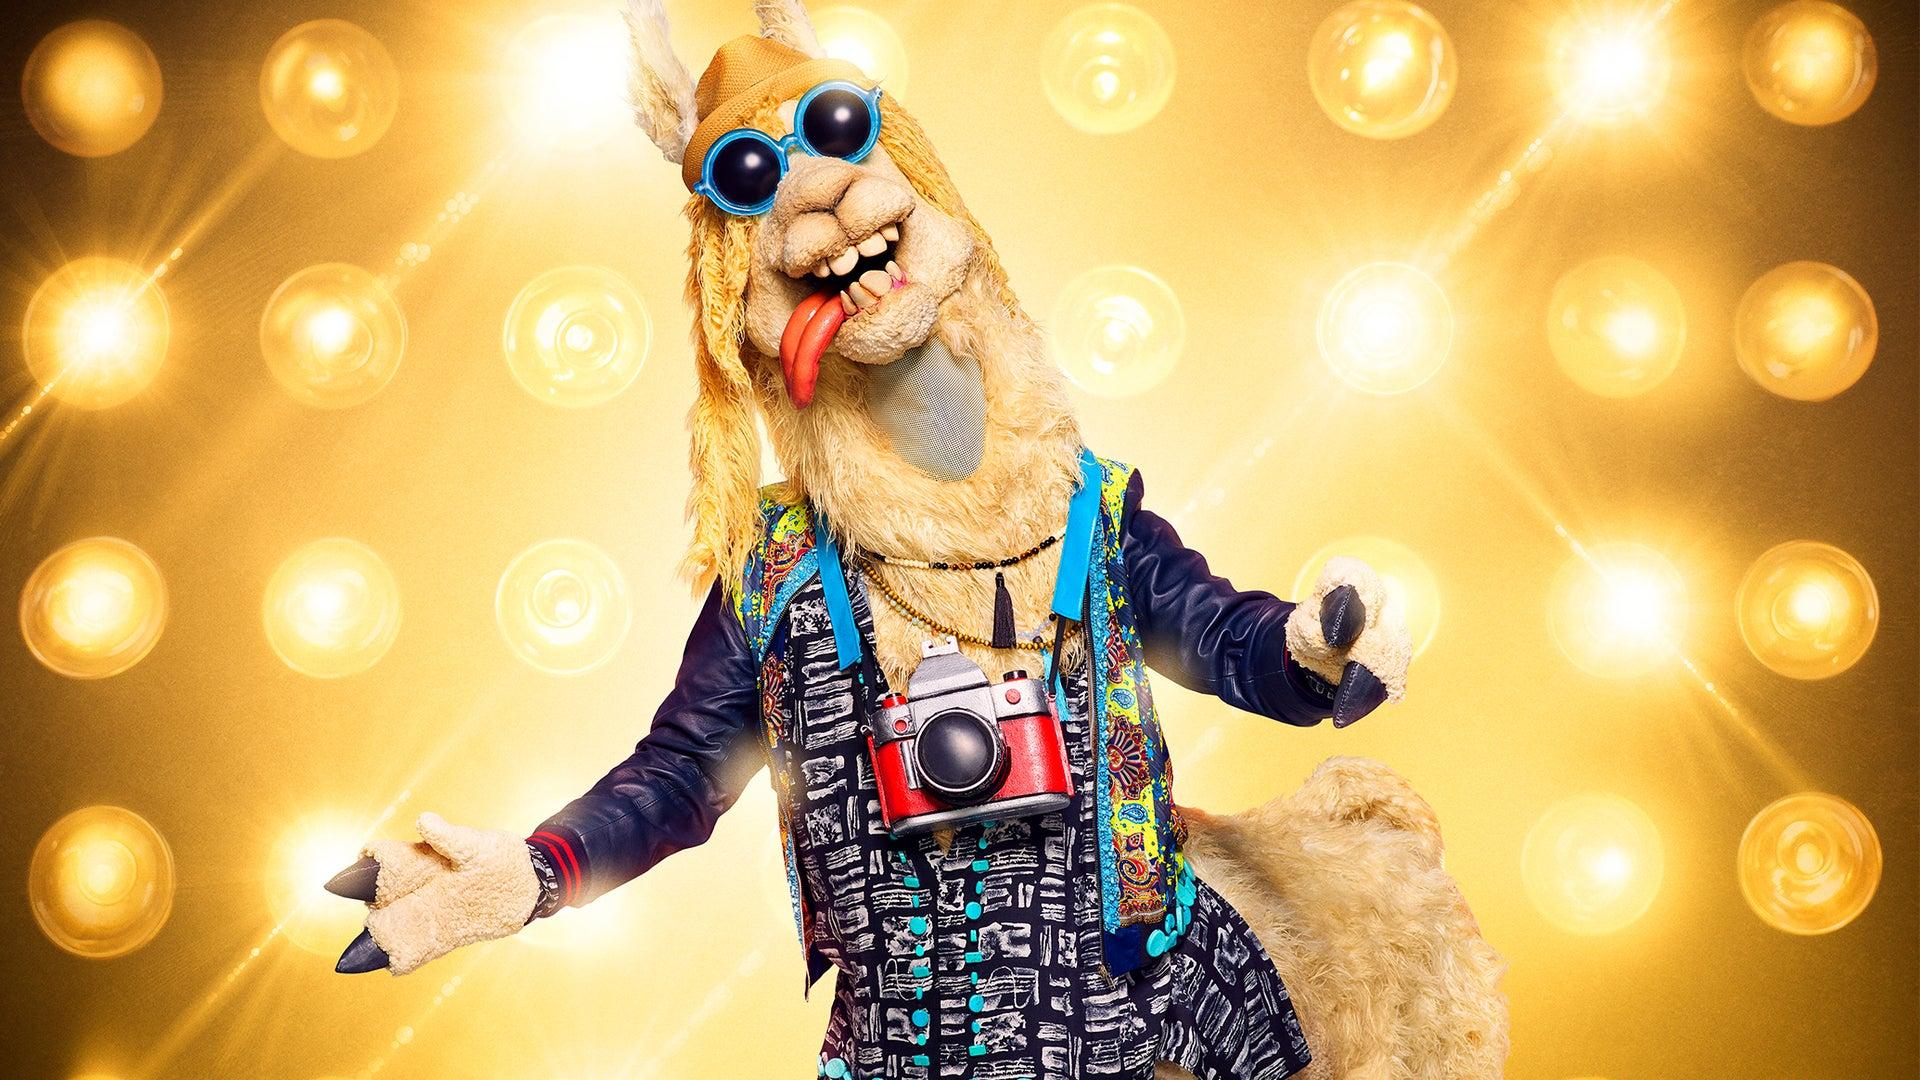 The Llama, The Masked Singer Season 3